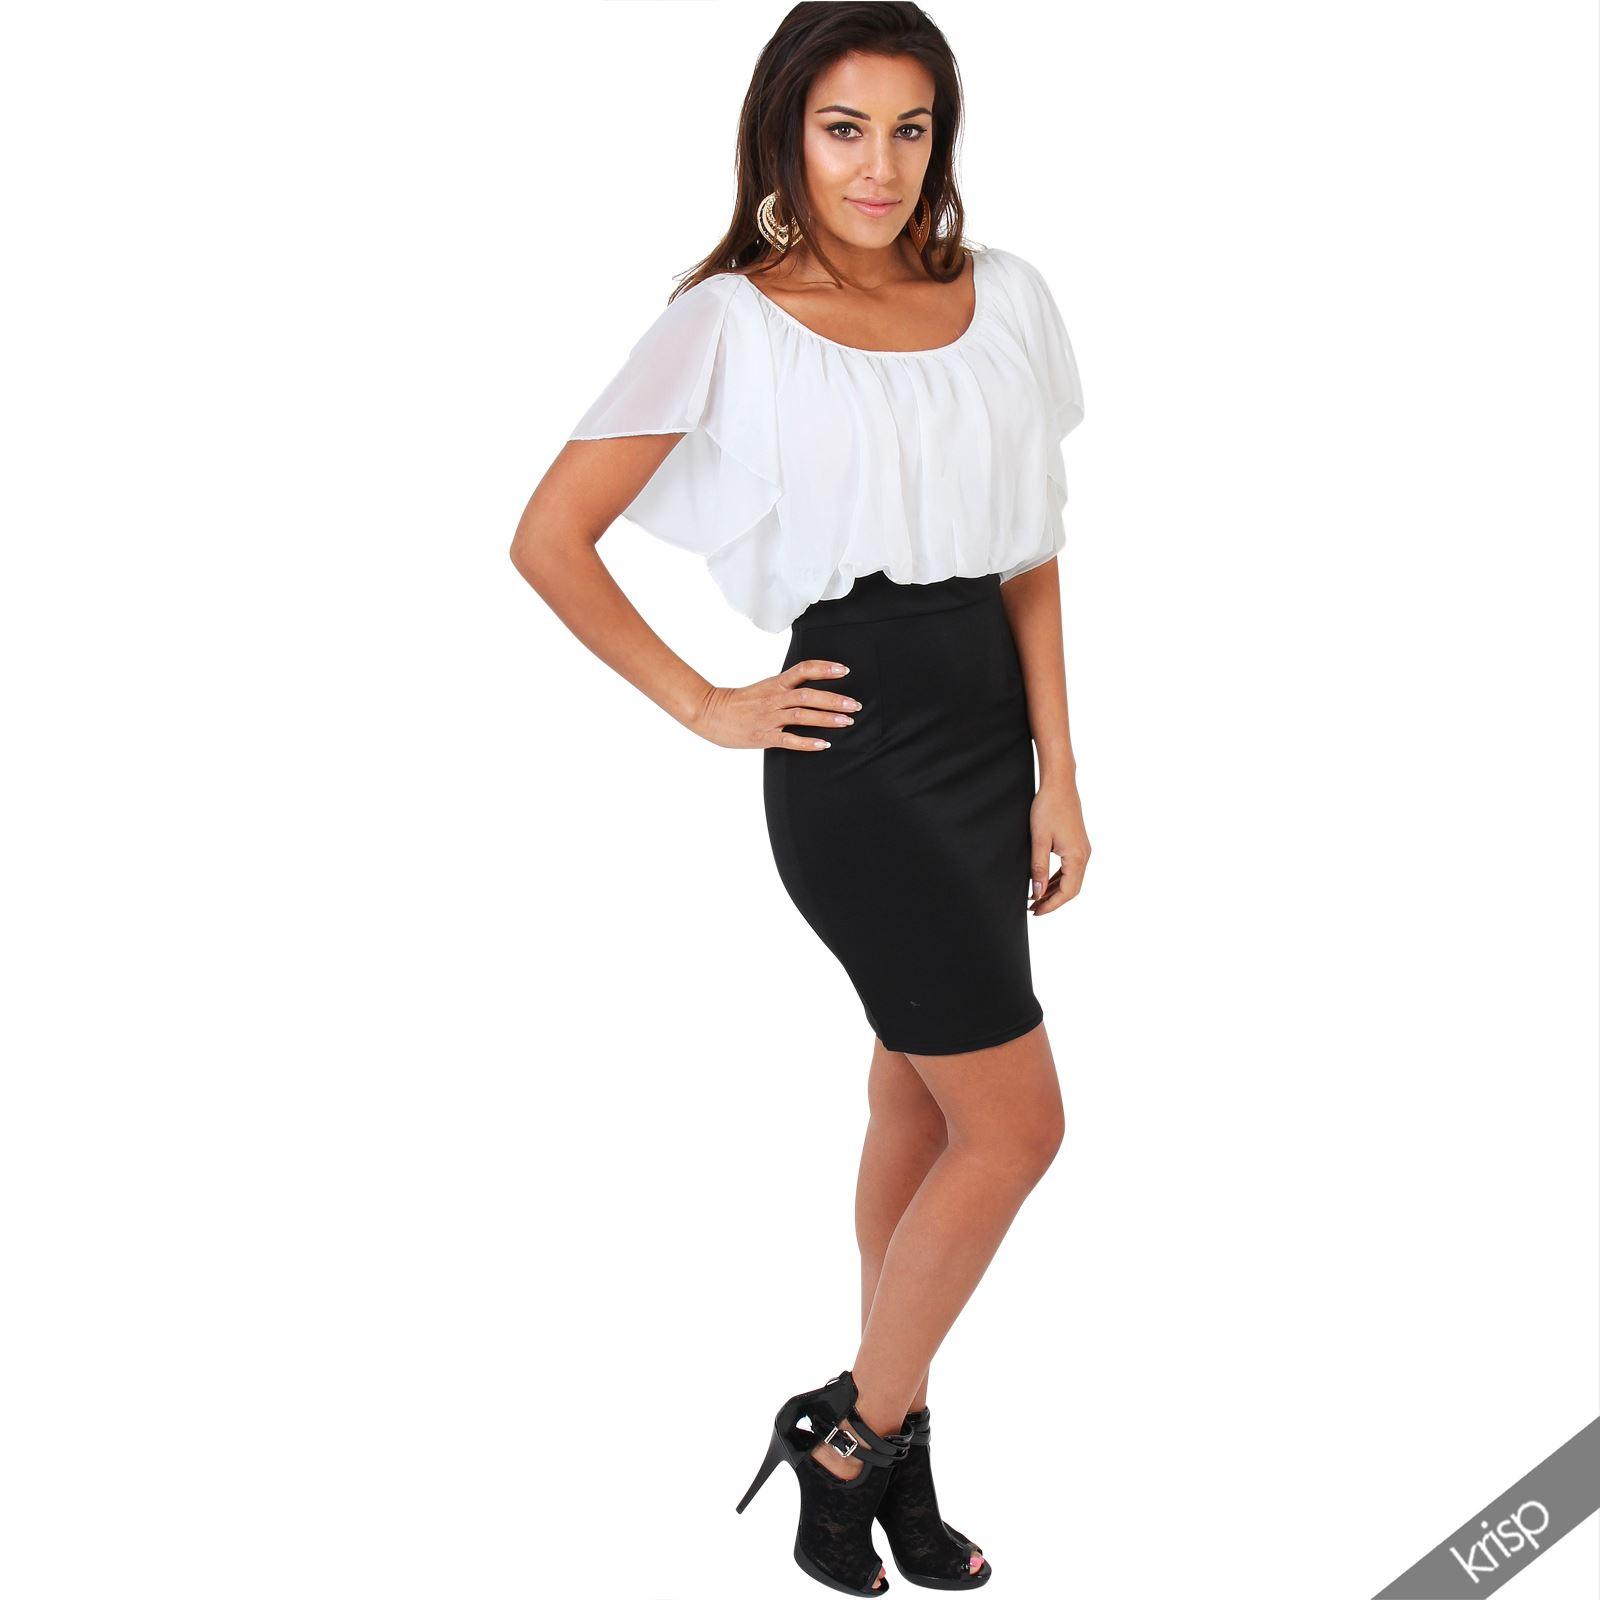 Womens-Pleated-Chiffon-Batwing-Top-High-Waist-Pencil-Bodycon-Skirt-Mini-Dress thumbnail 14